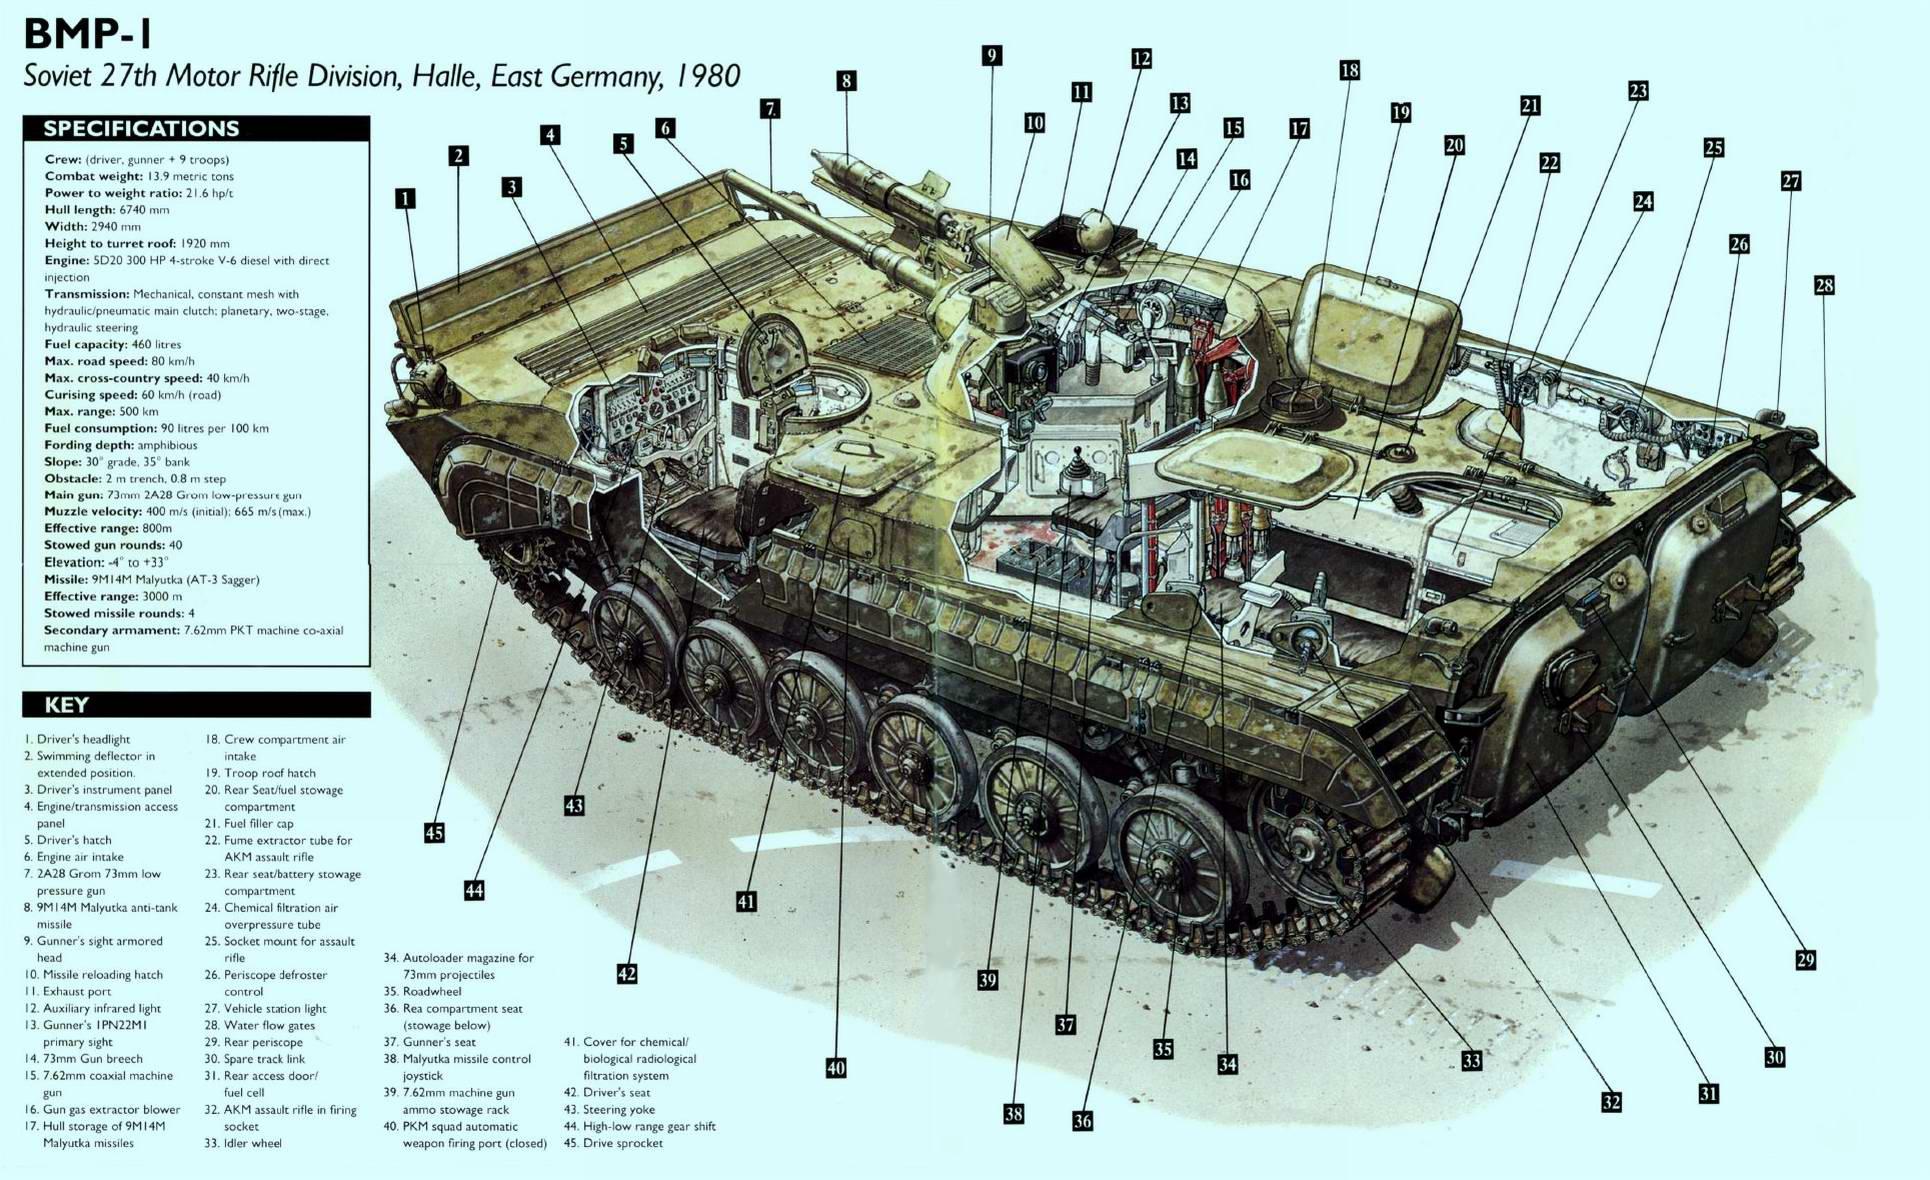 БМП-1 (1966 - 88 г.г.) - боевая машина пехоты (СССР)